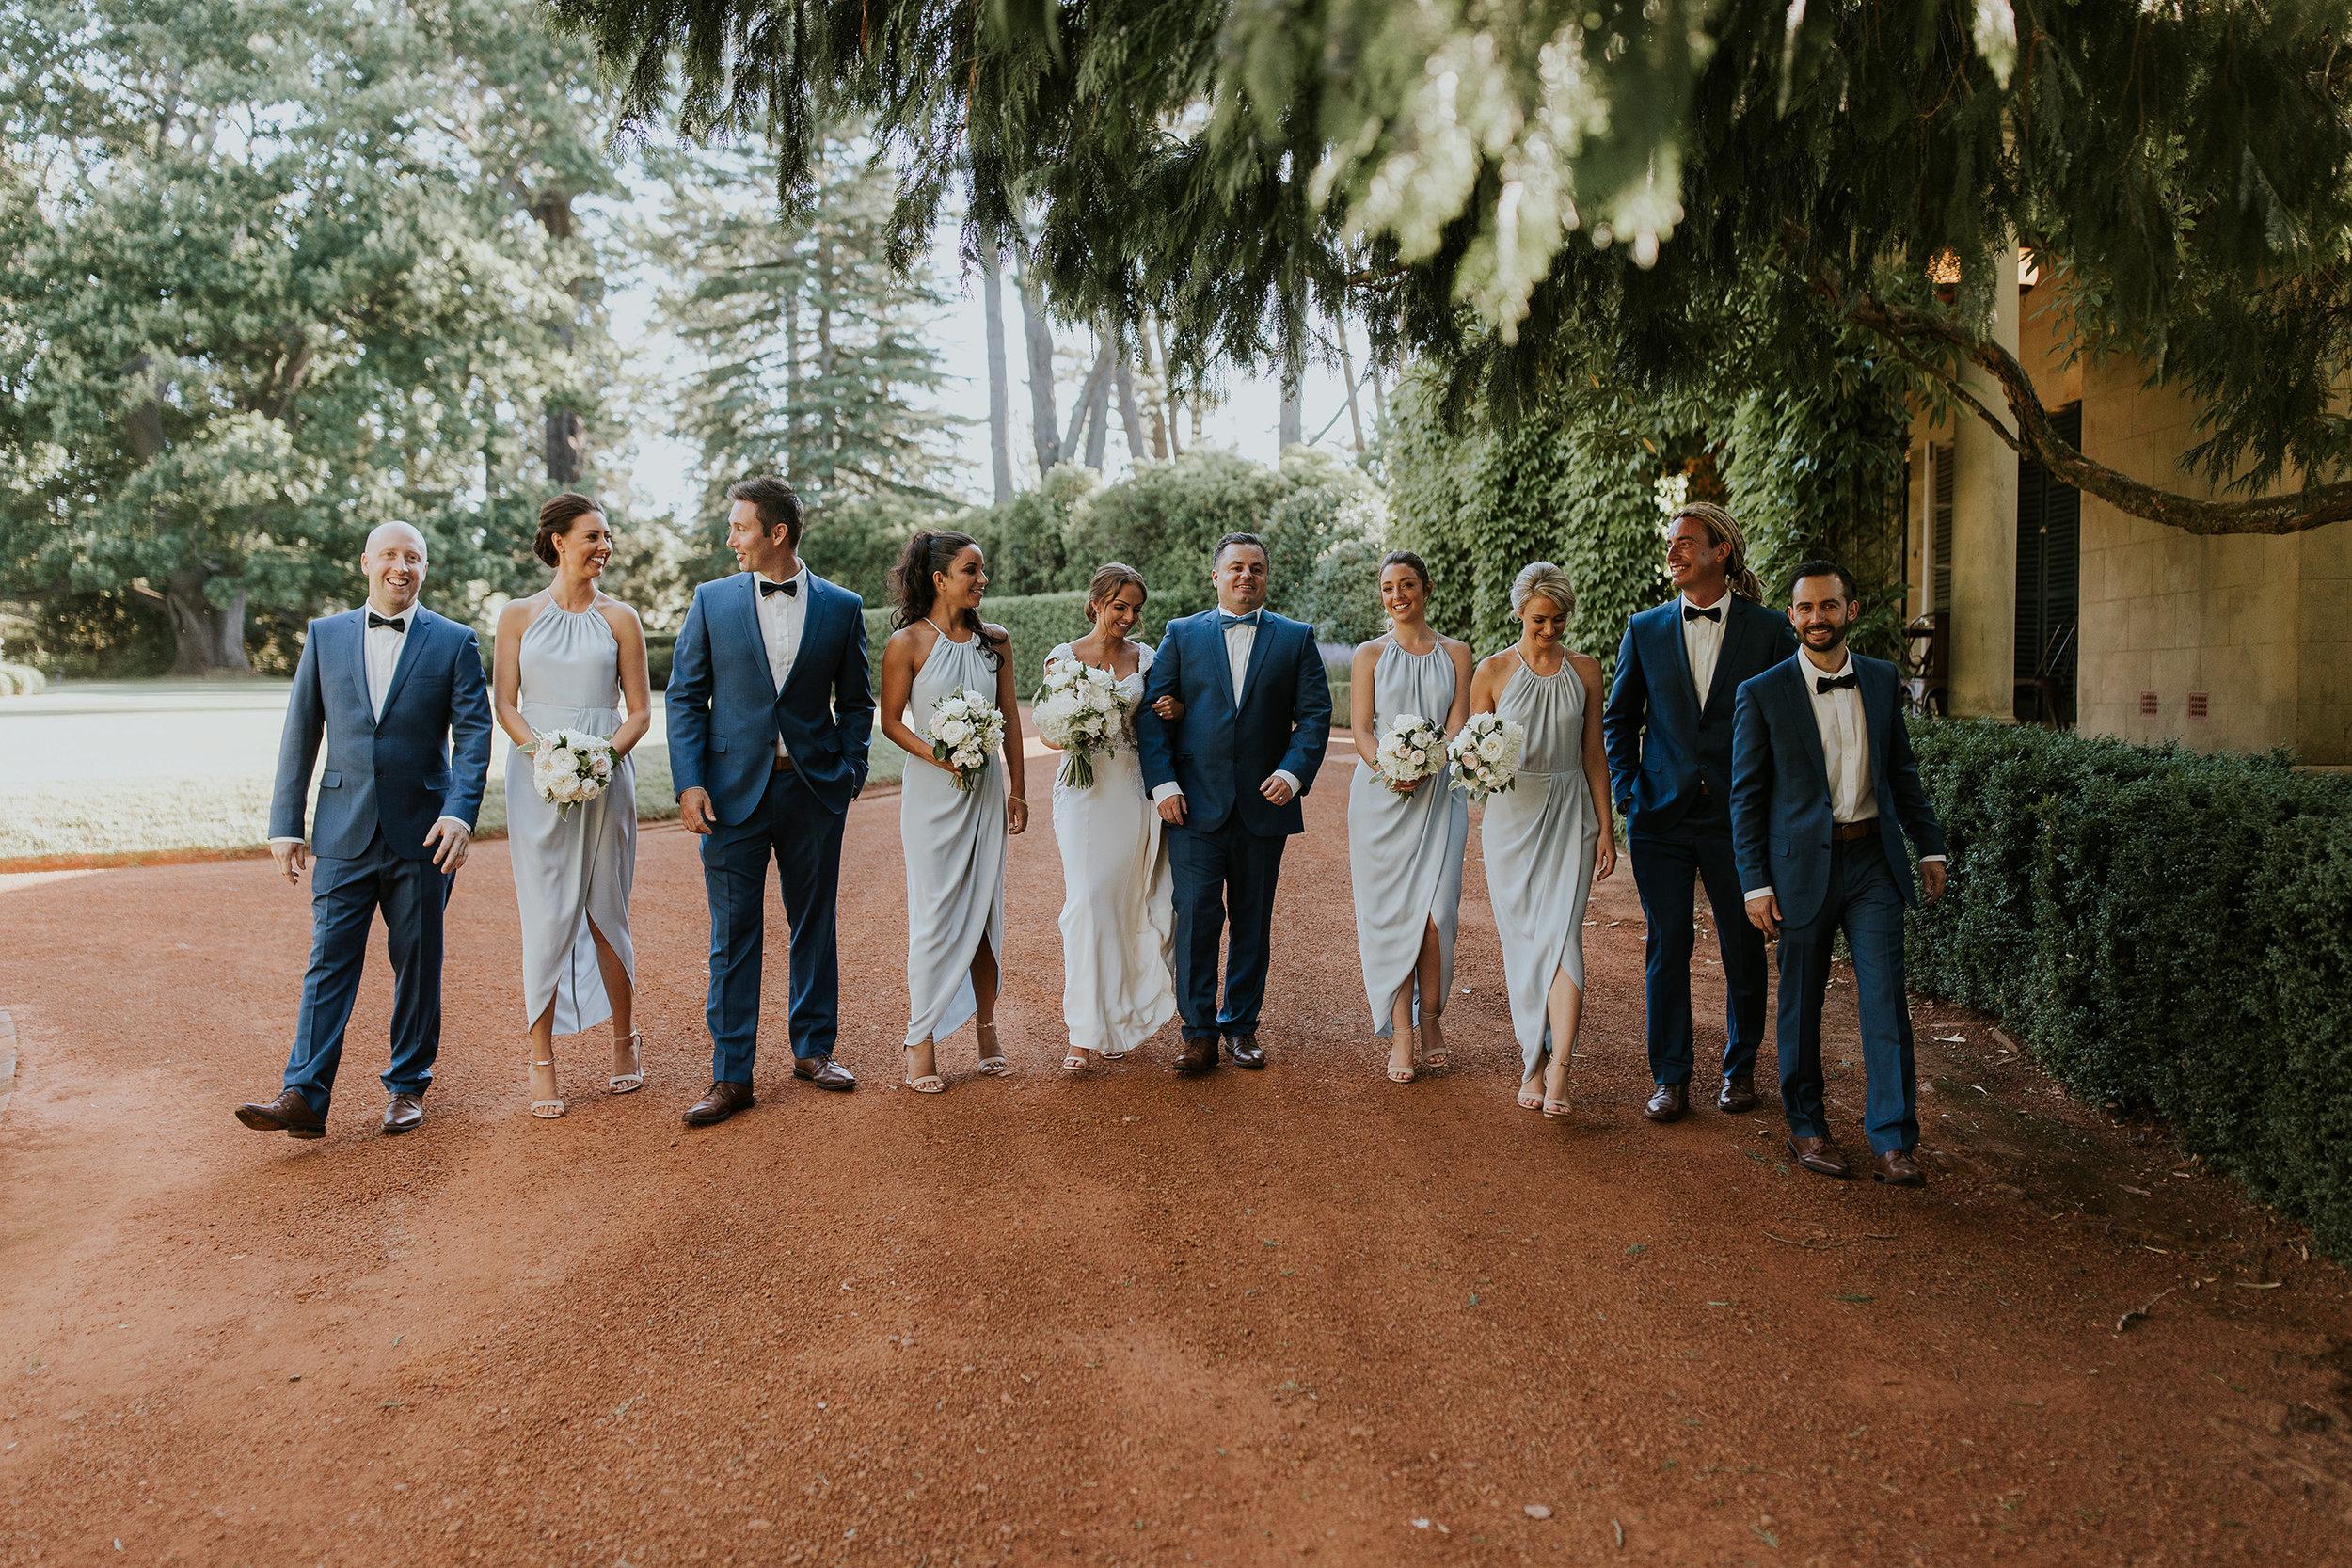 keli-luke-maybury-wedding-311_1.jpg